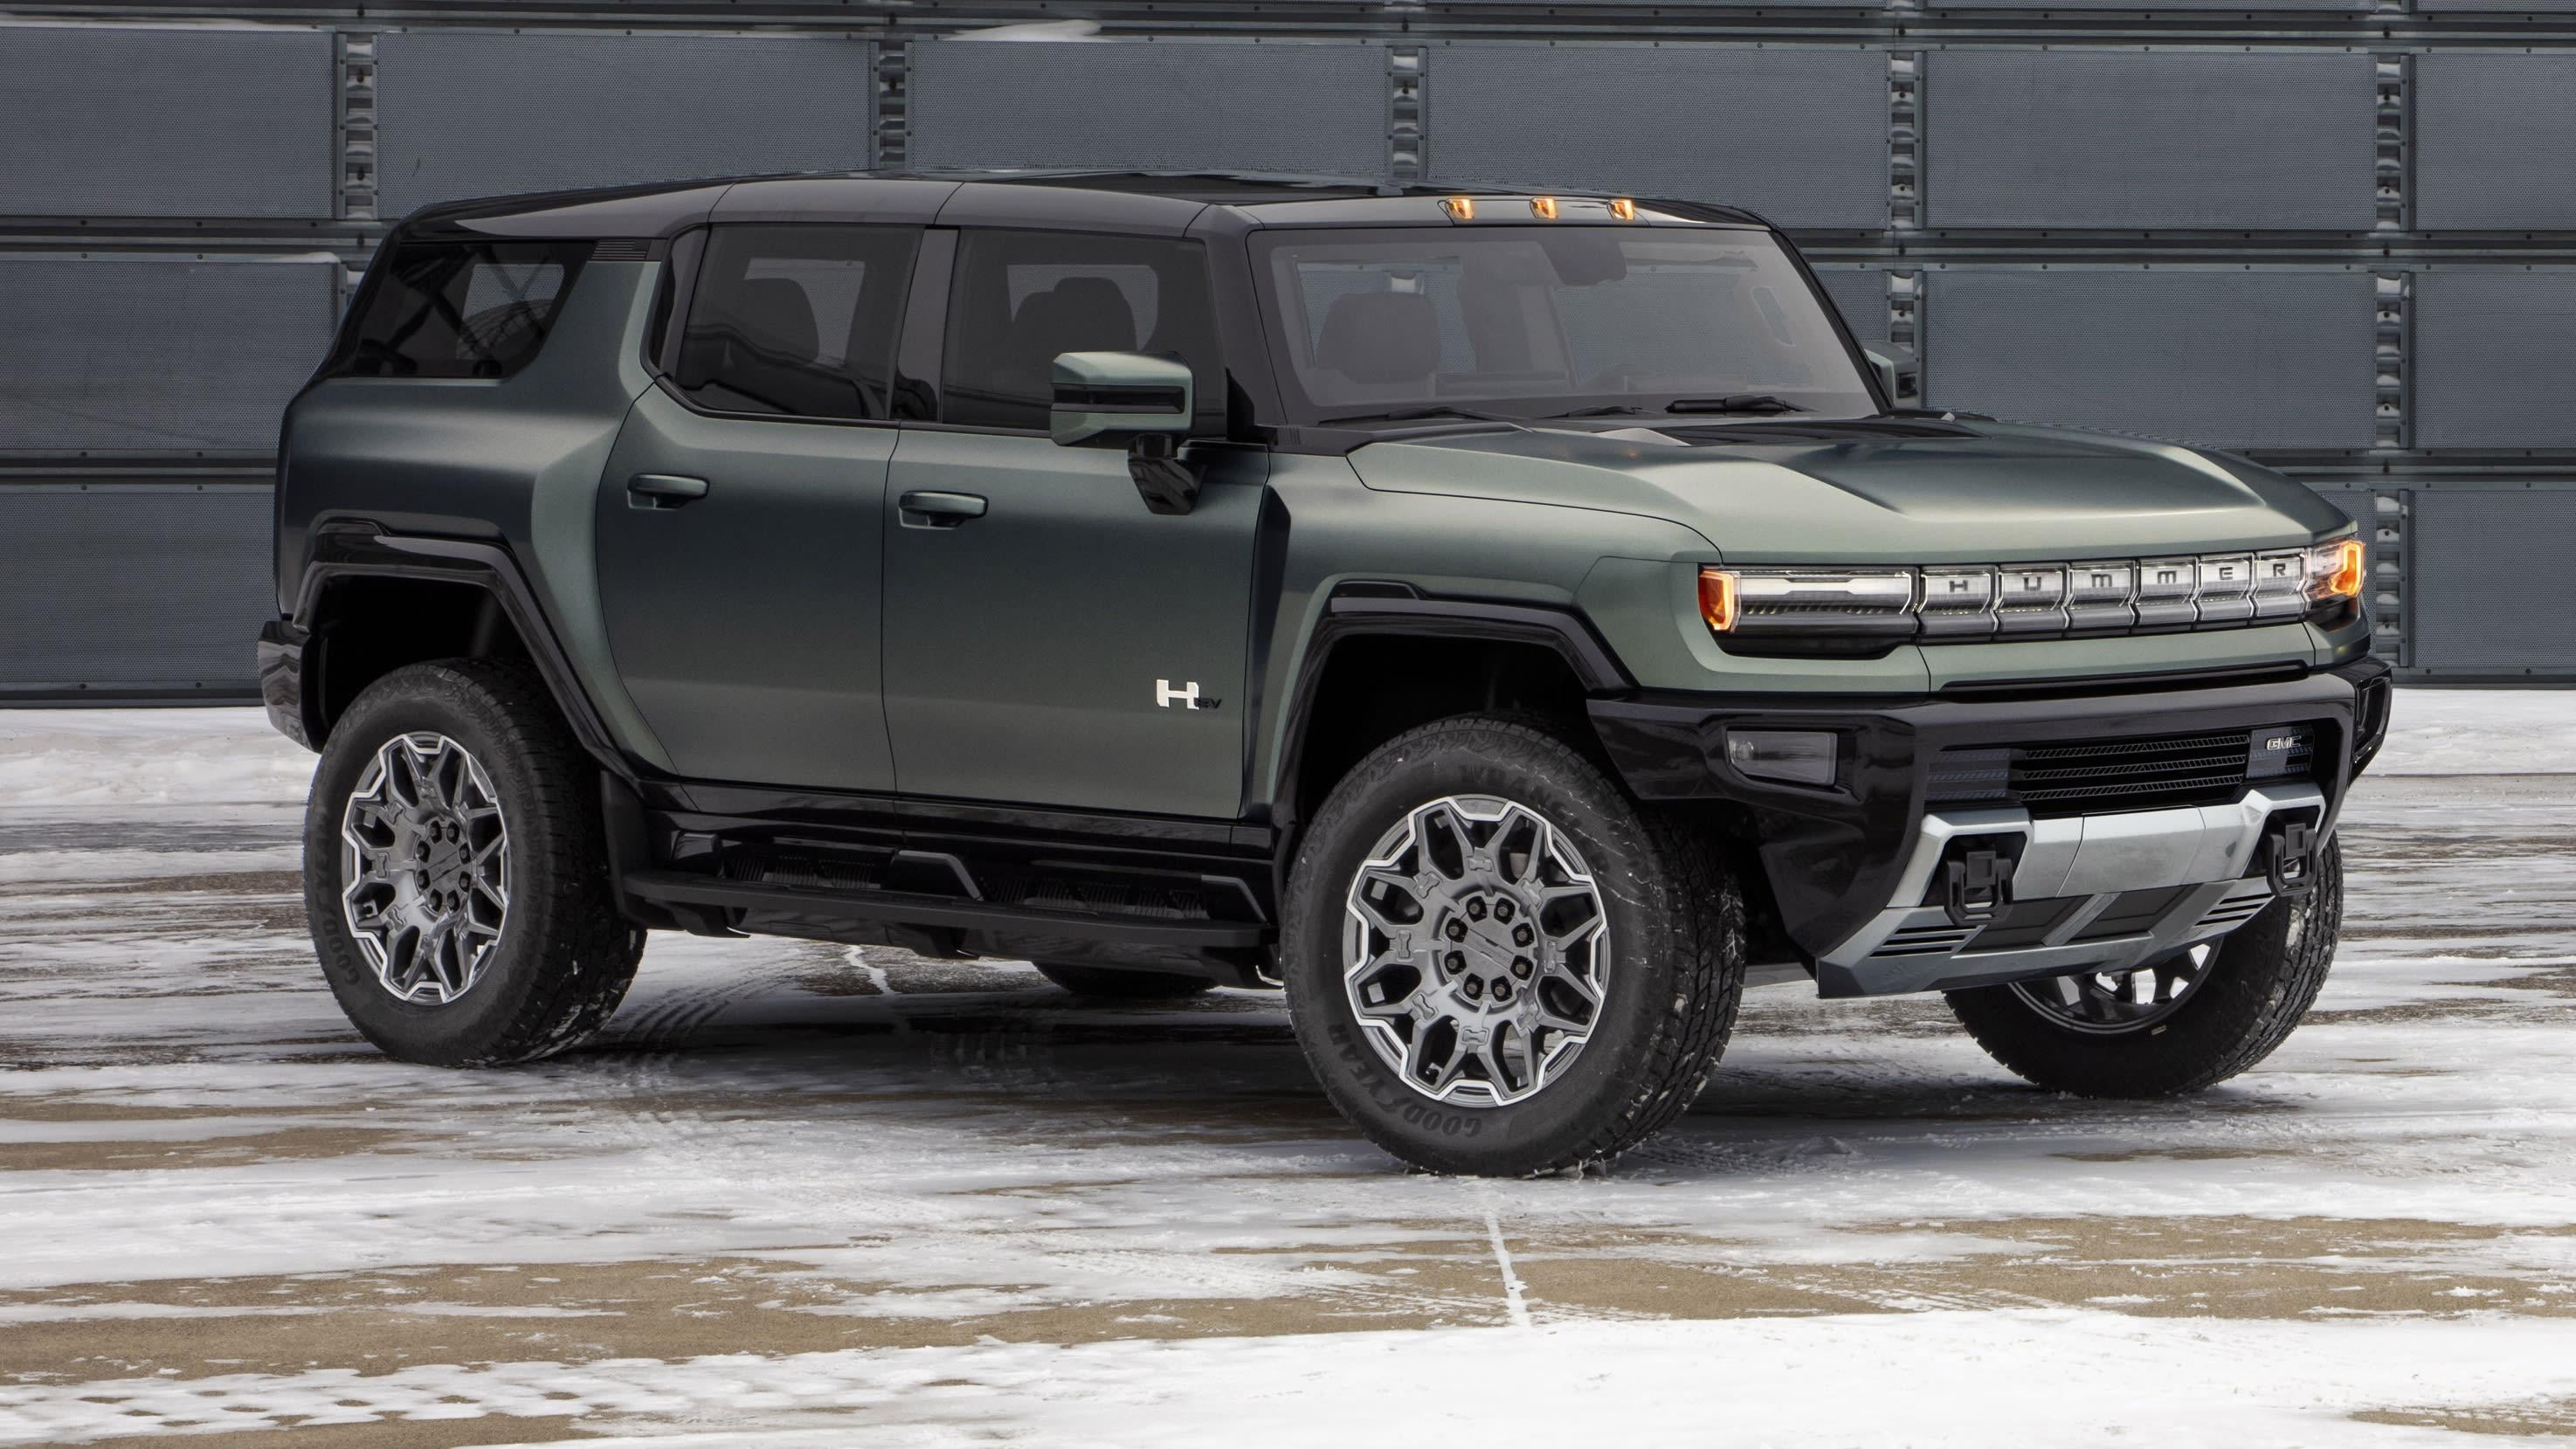 2024 GMC Hummer EV SUV revealed, Australian potential unclear